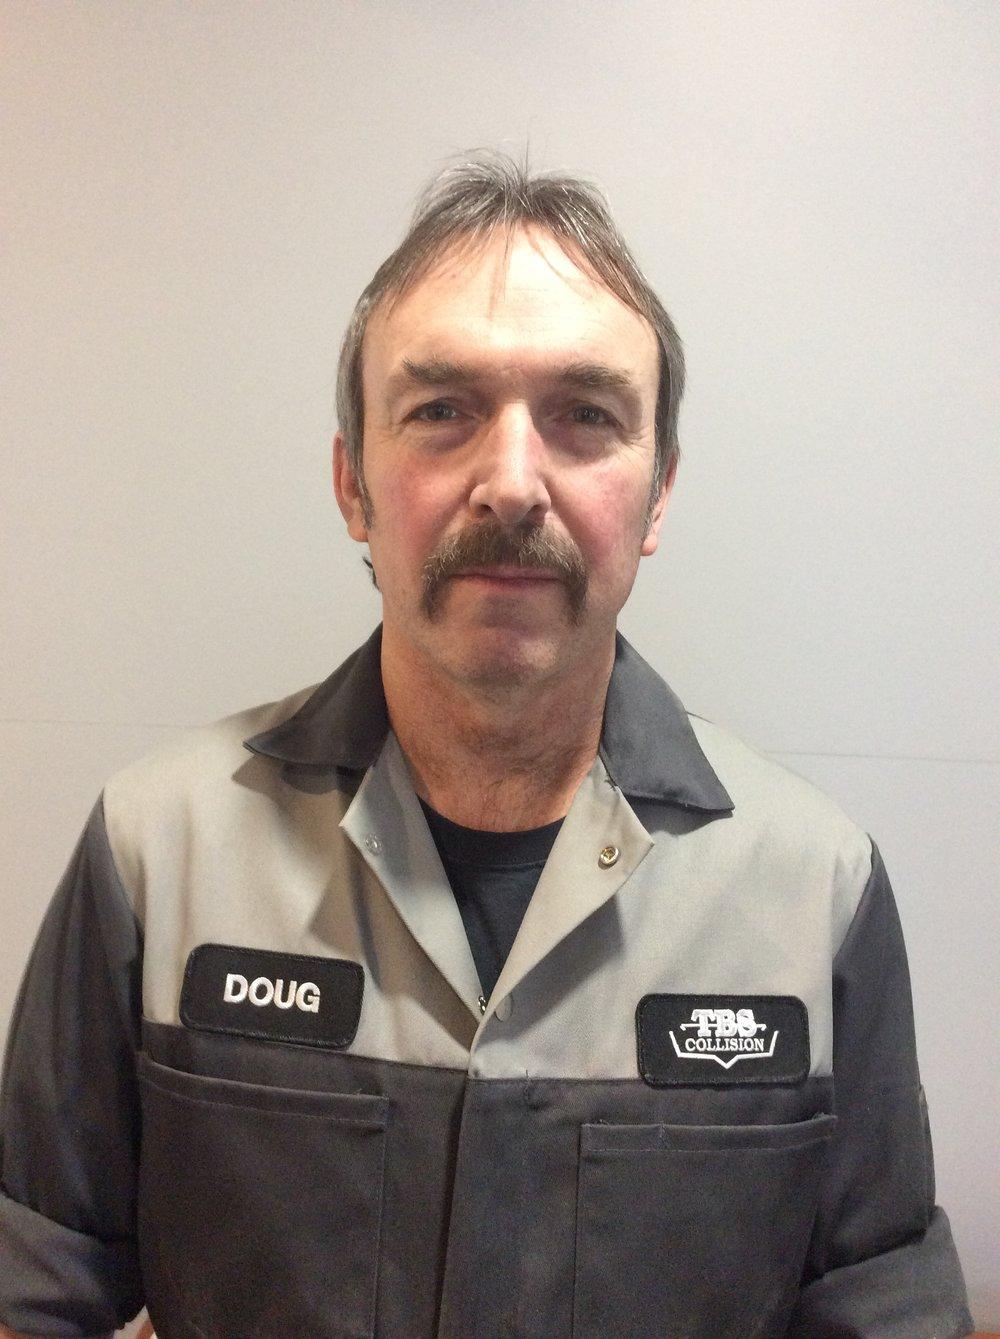 Doug - Prep (2004)